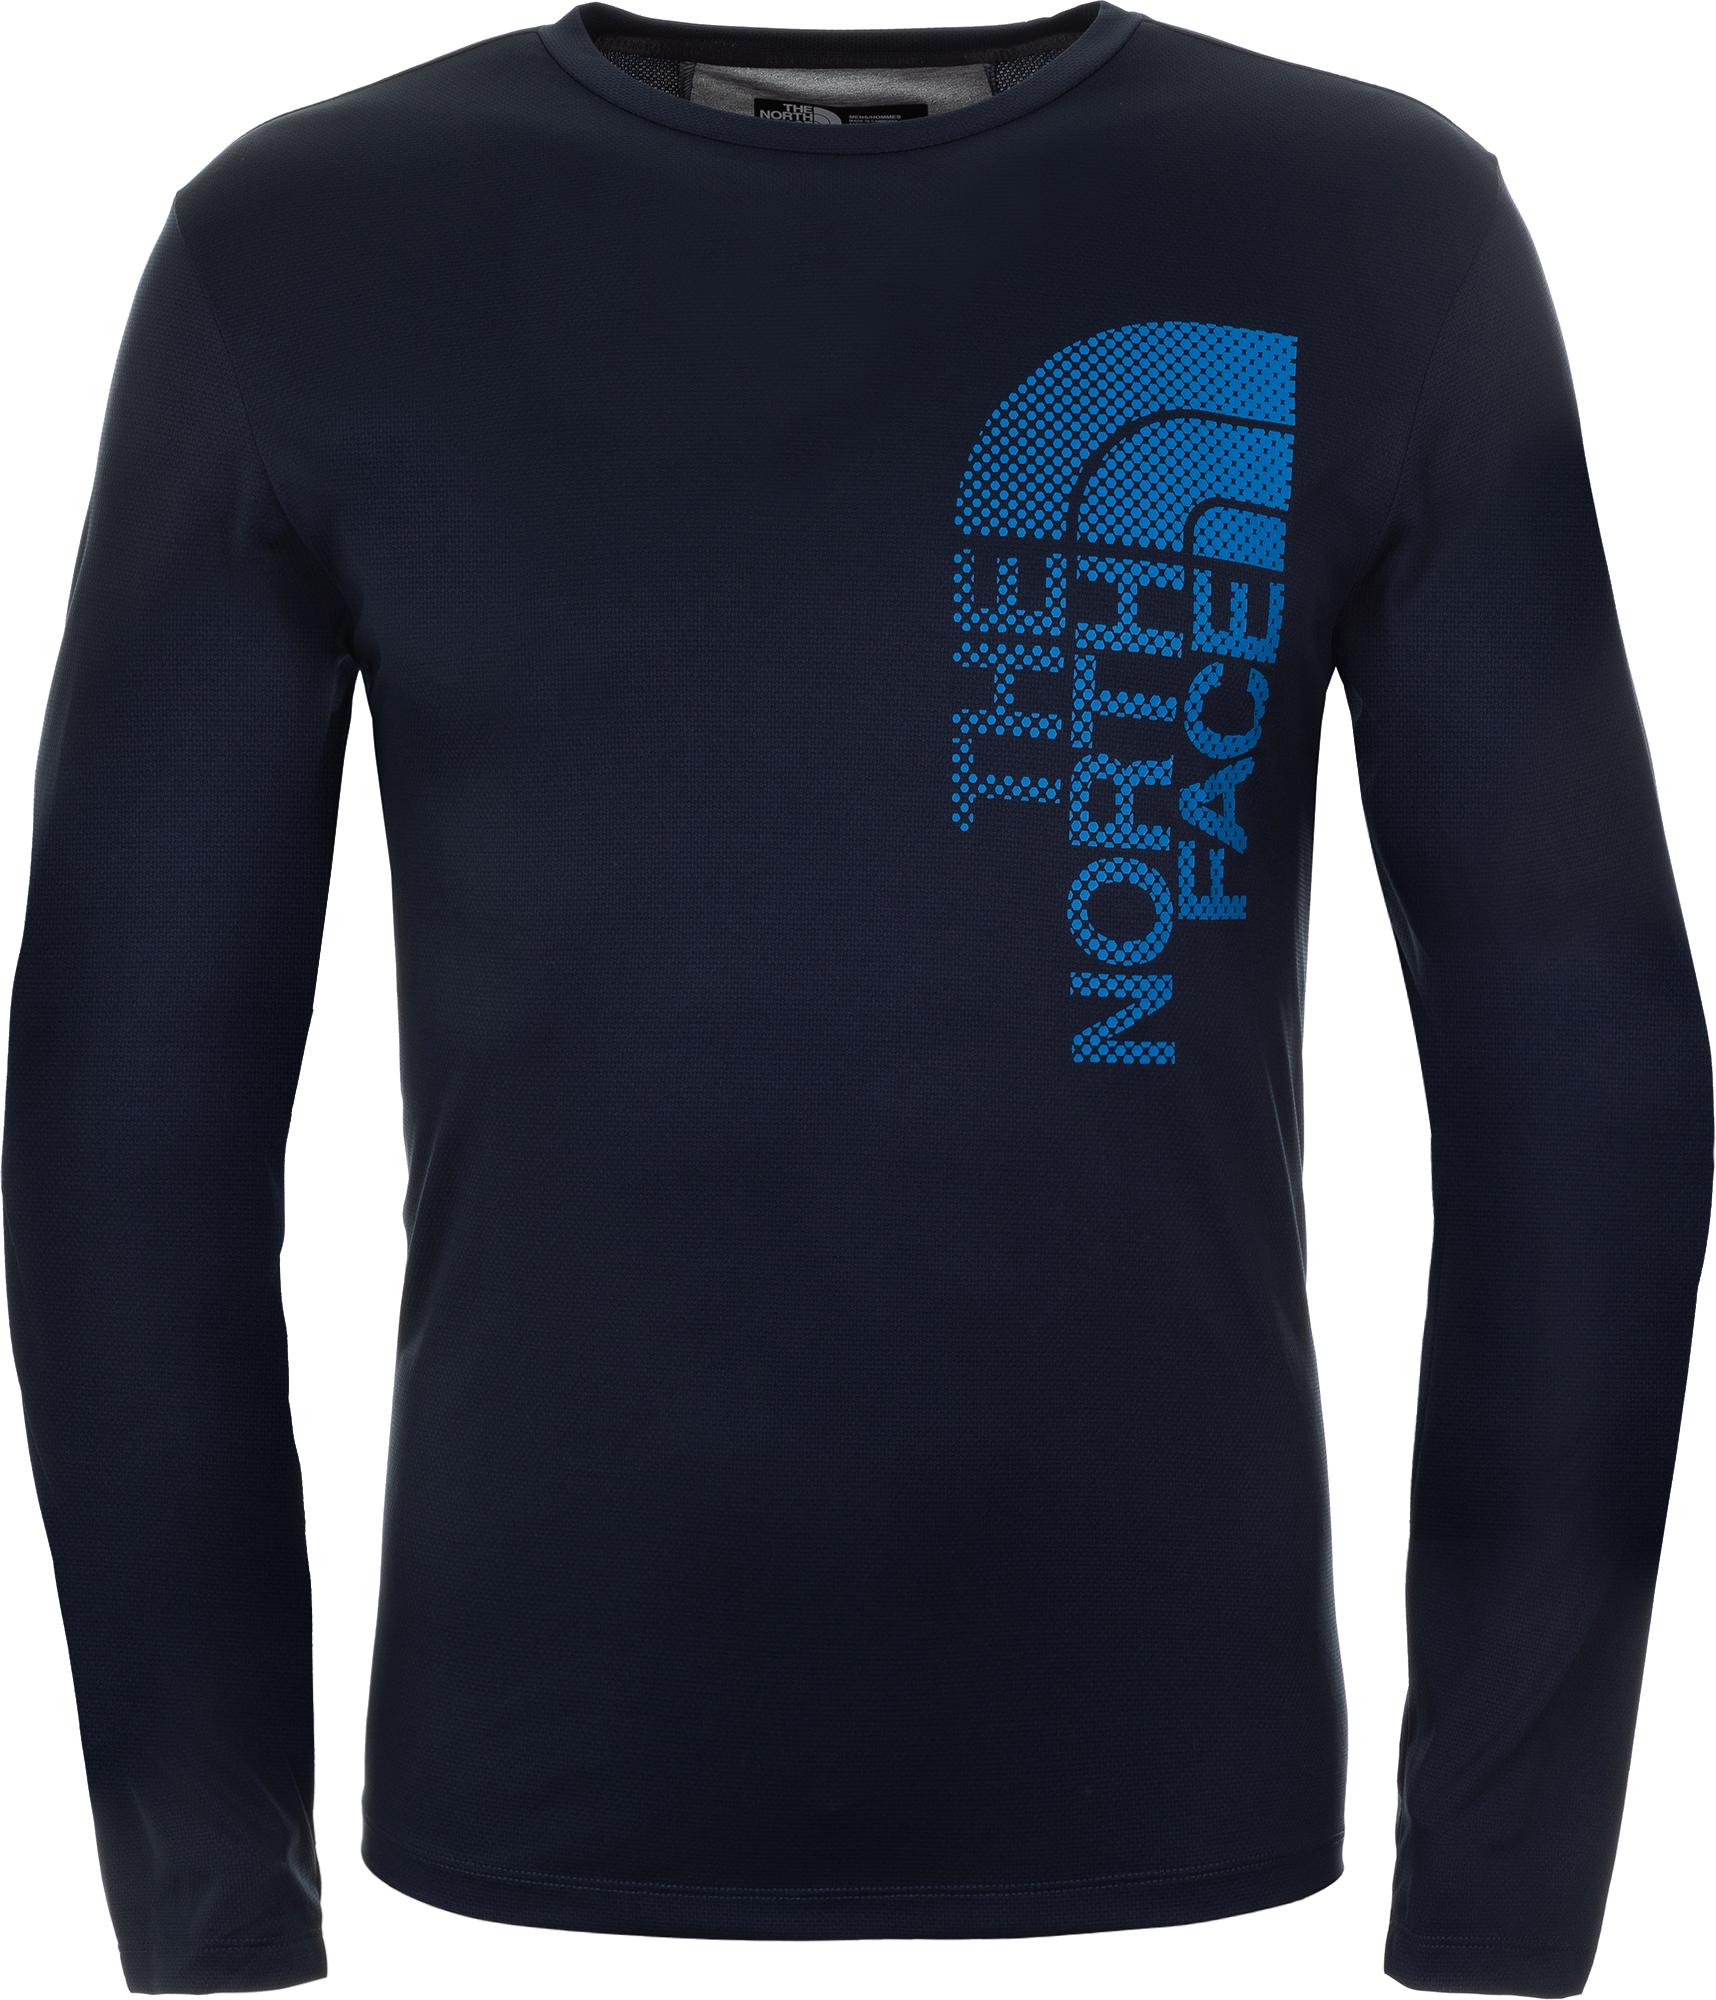 The North Face Футболка с длинным рукавом мужская The North Face Ondras, размер 52 футболка спортивная the north face the north face th016eweyha1